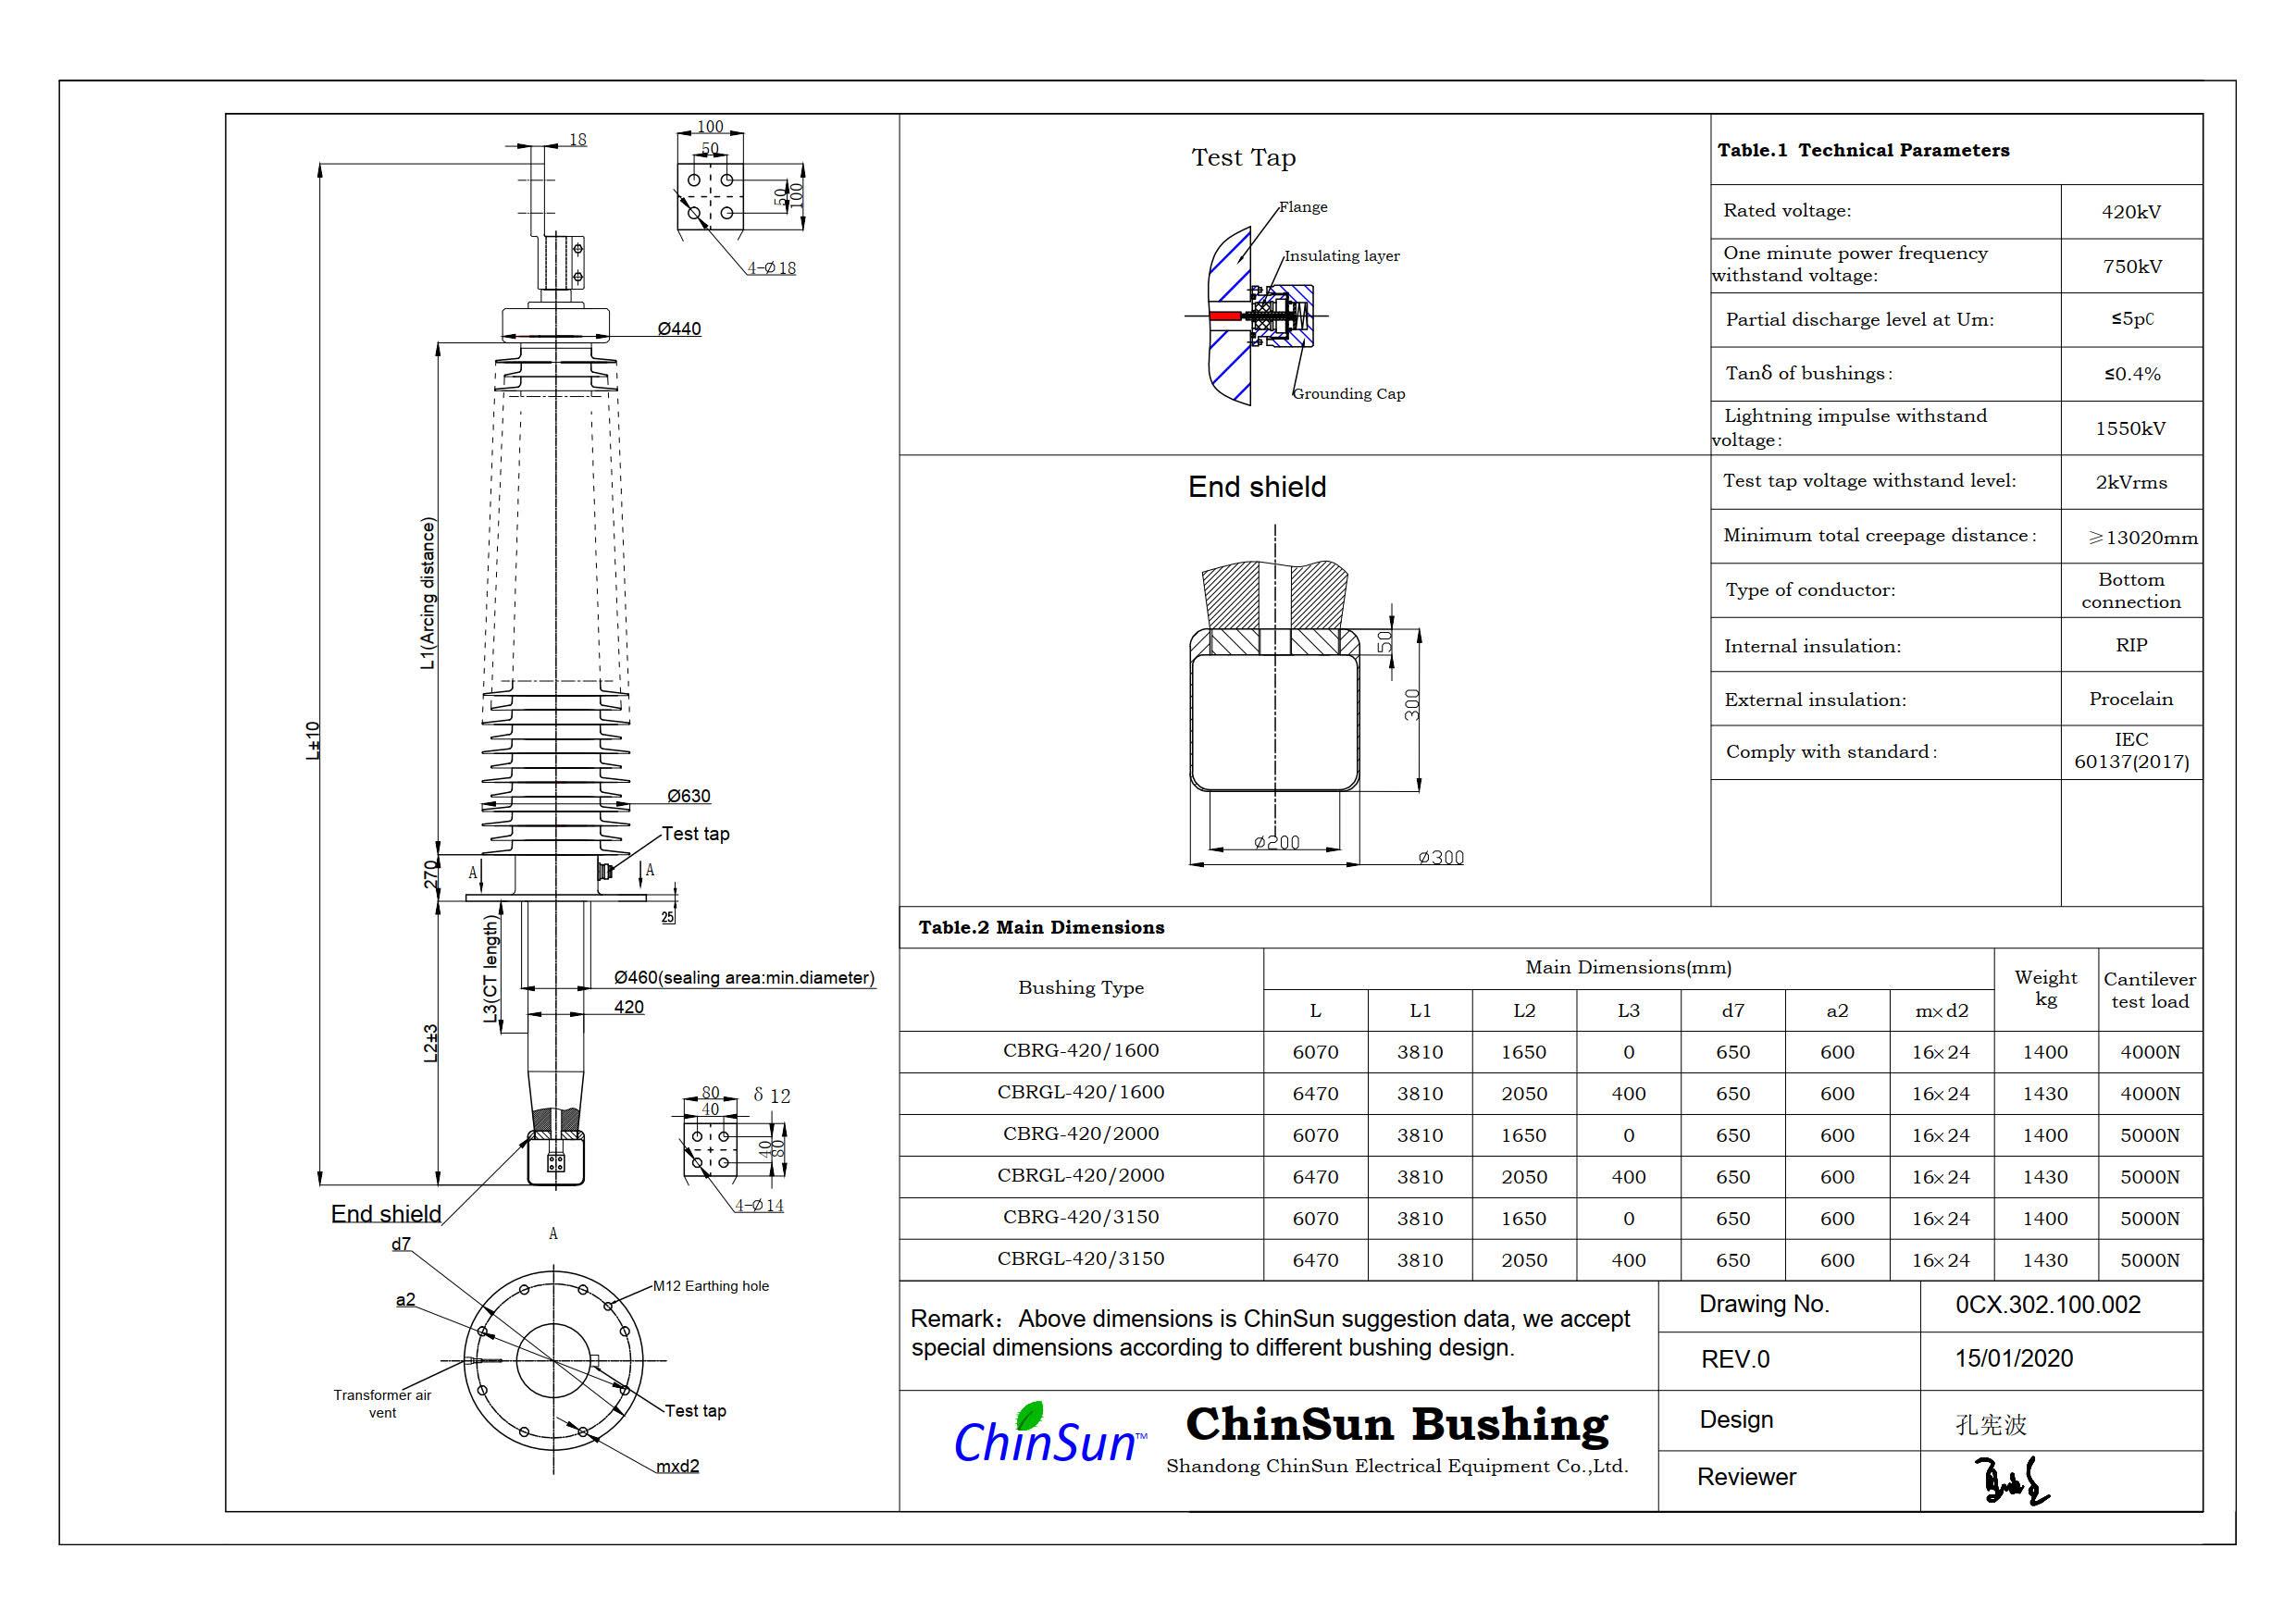 Drawing-transformer bushing-420kV procelain-BC-ChinSun